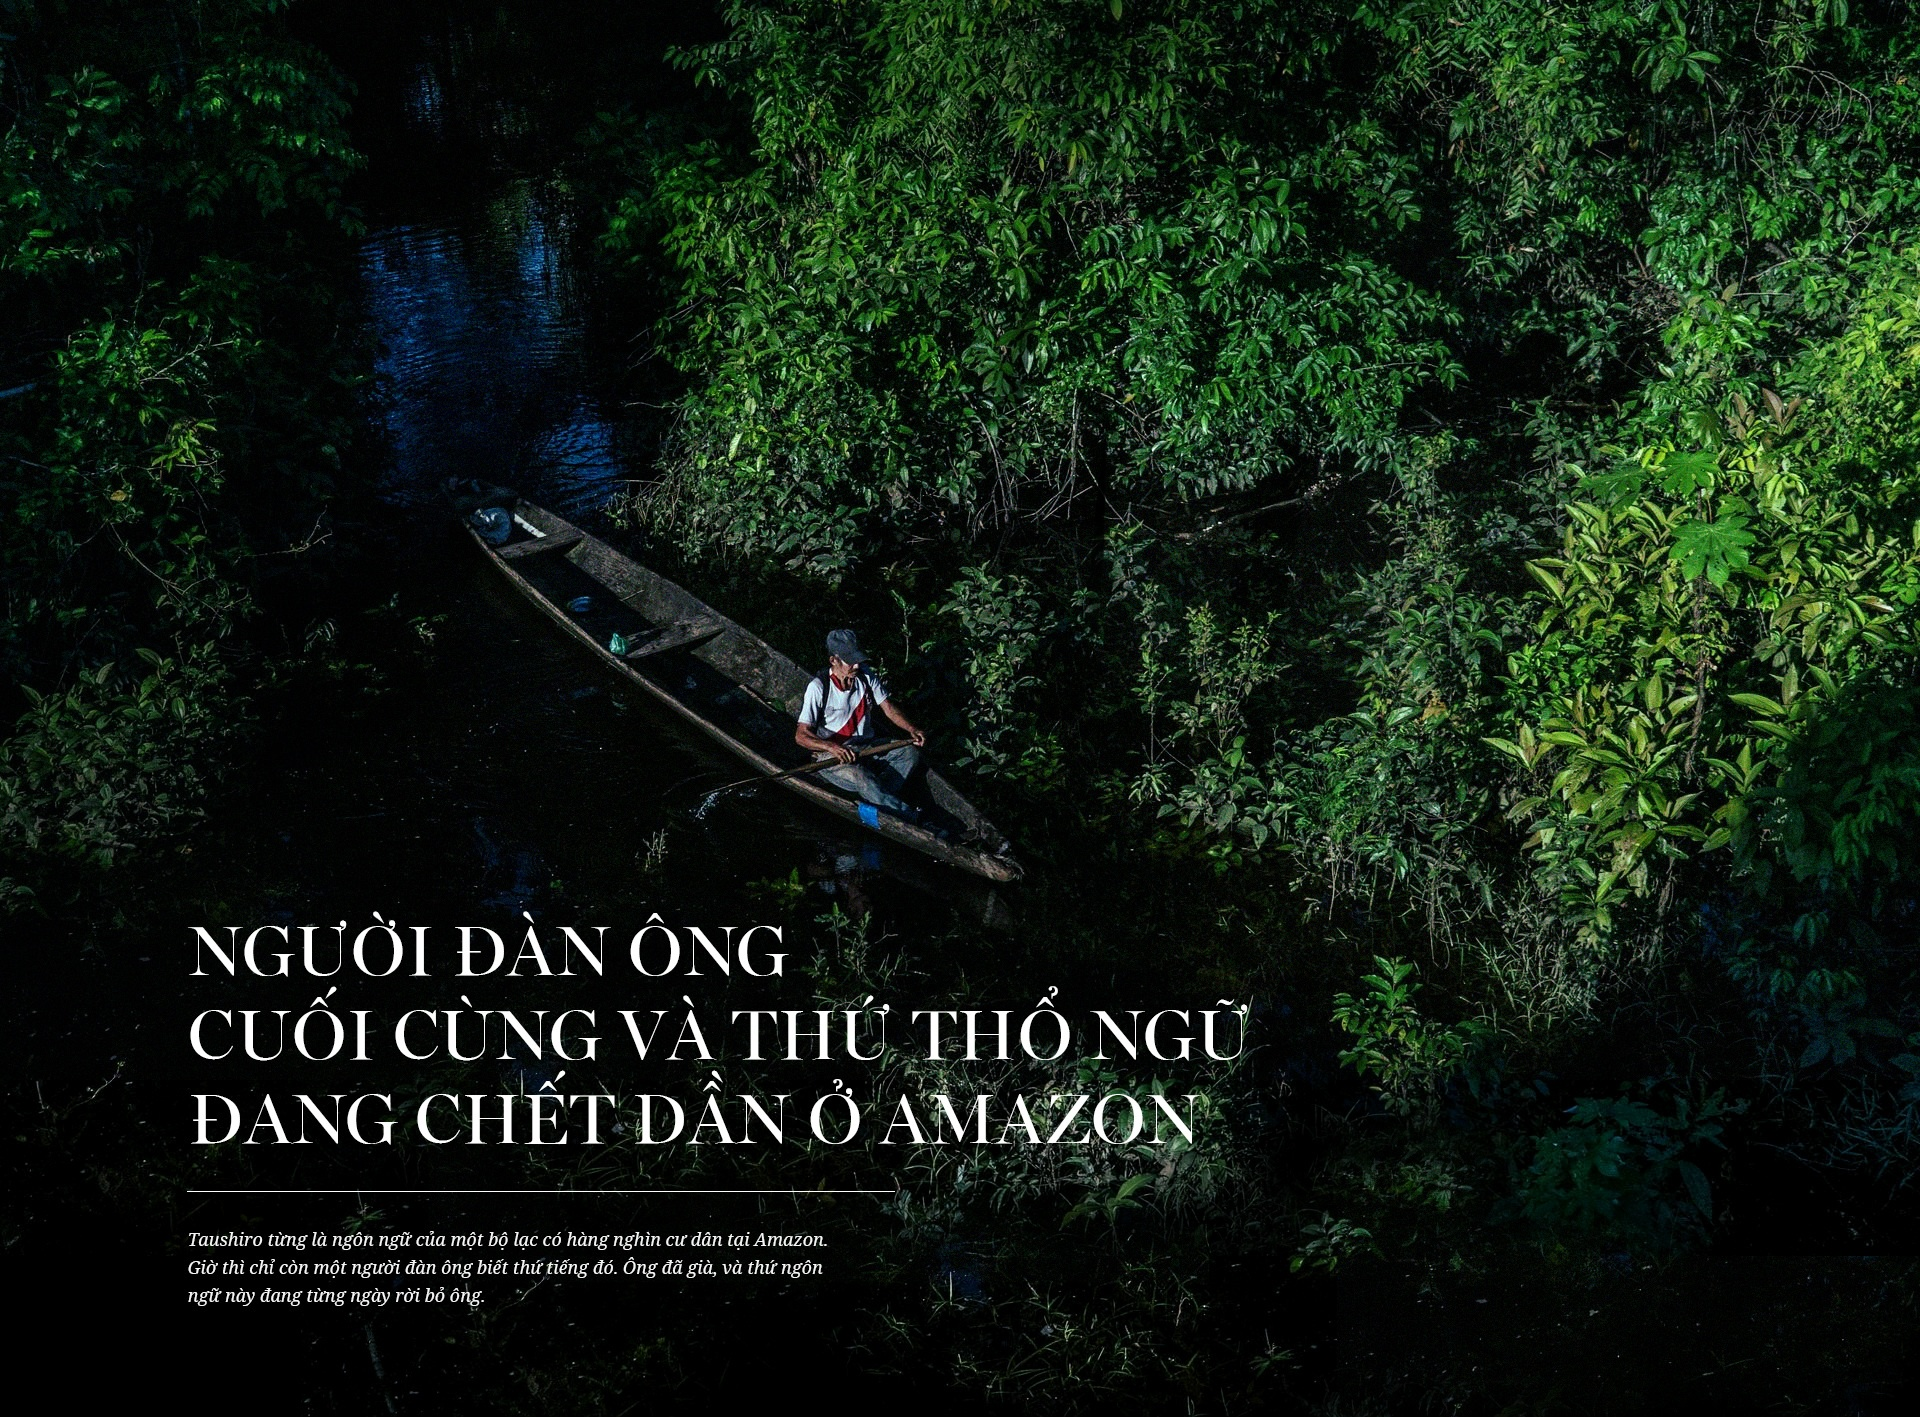 Amazon va nguoi dan ong cuoi cung cua mot ngon ngu hinh anh 2